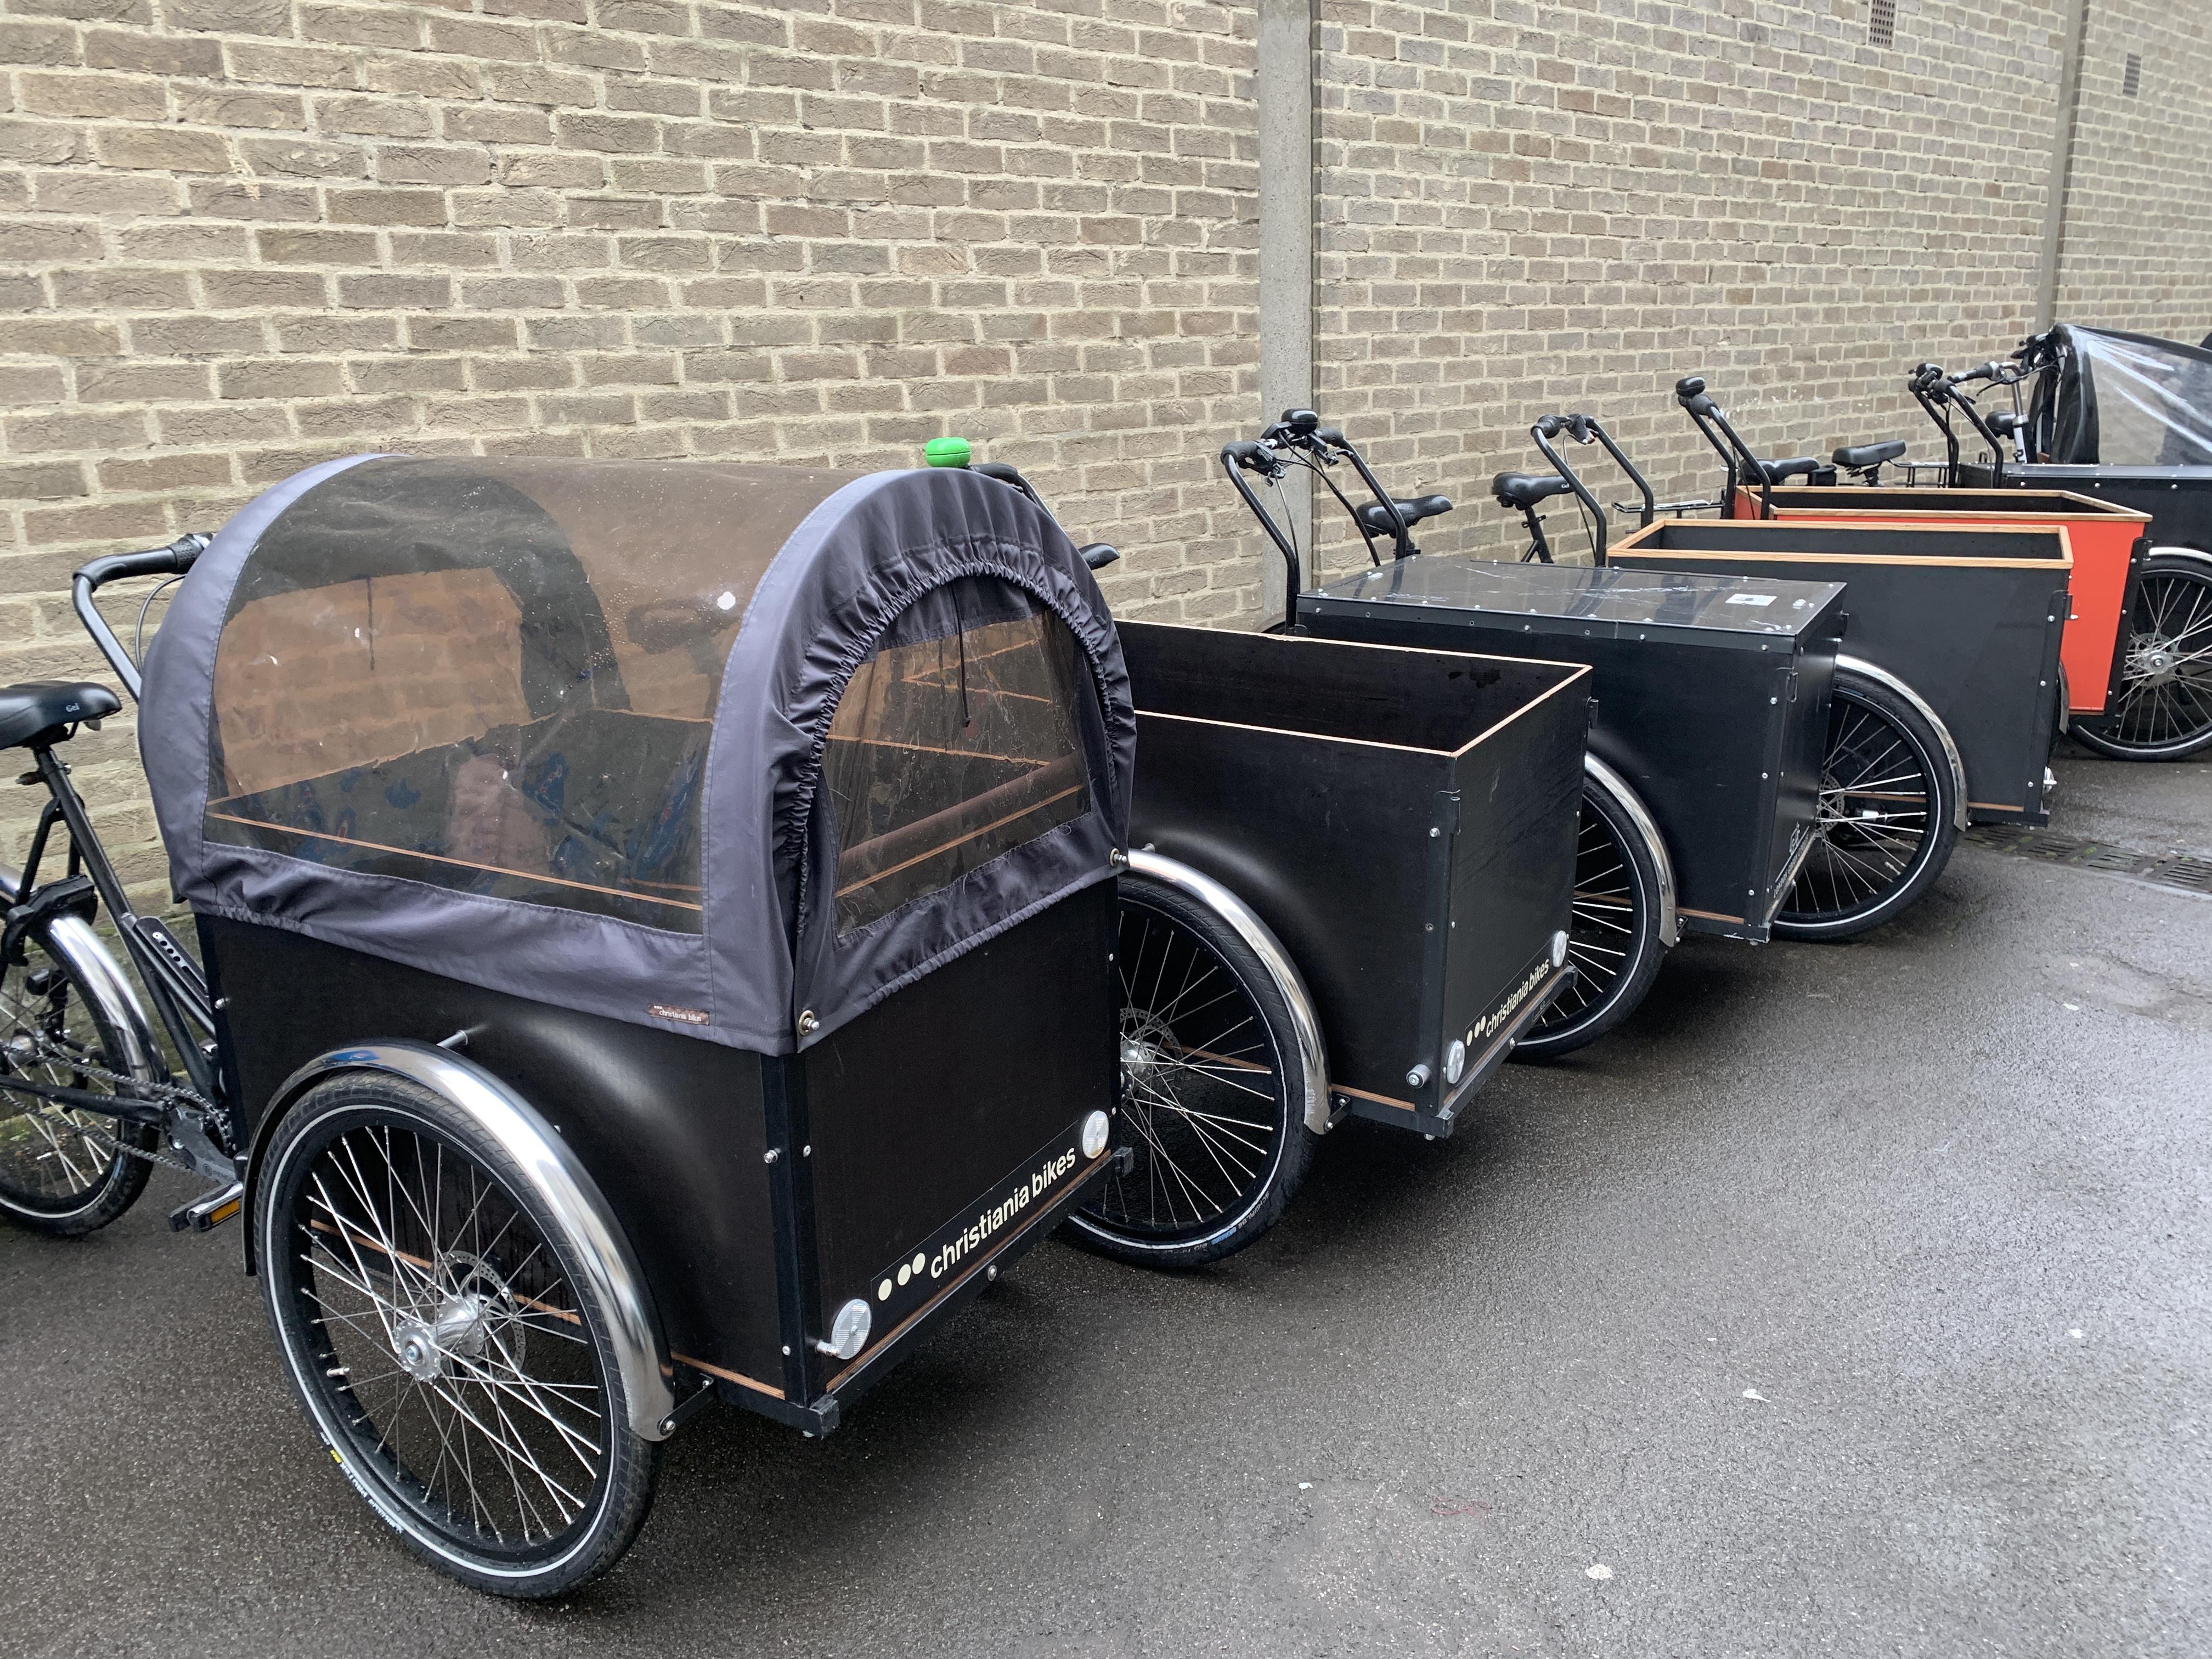 Ex-rental Christiania fleet | London Green Cycles